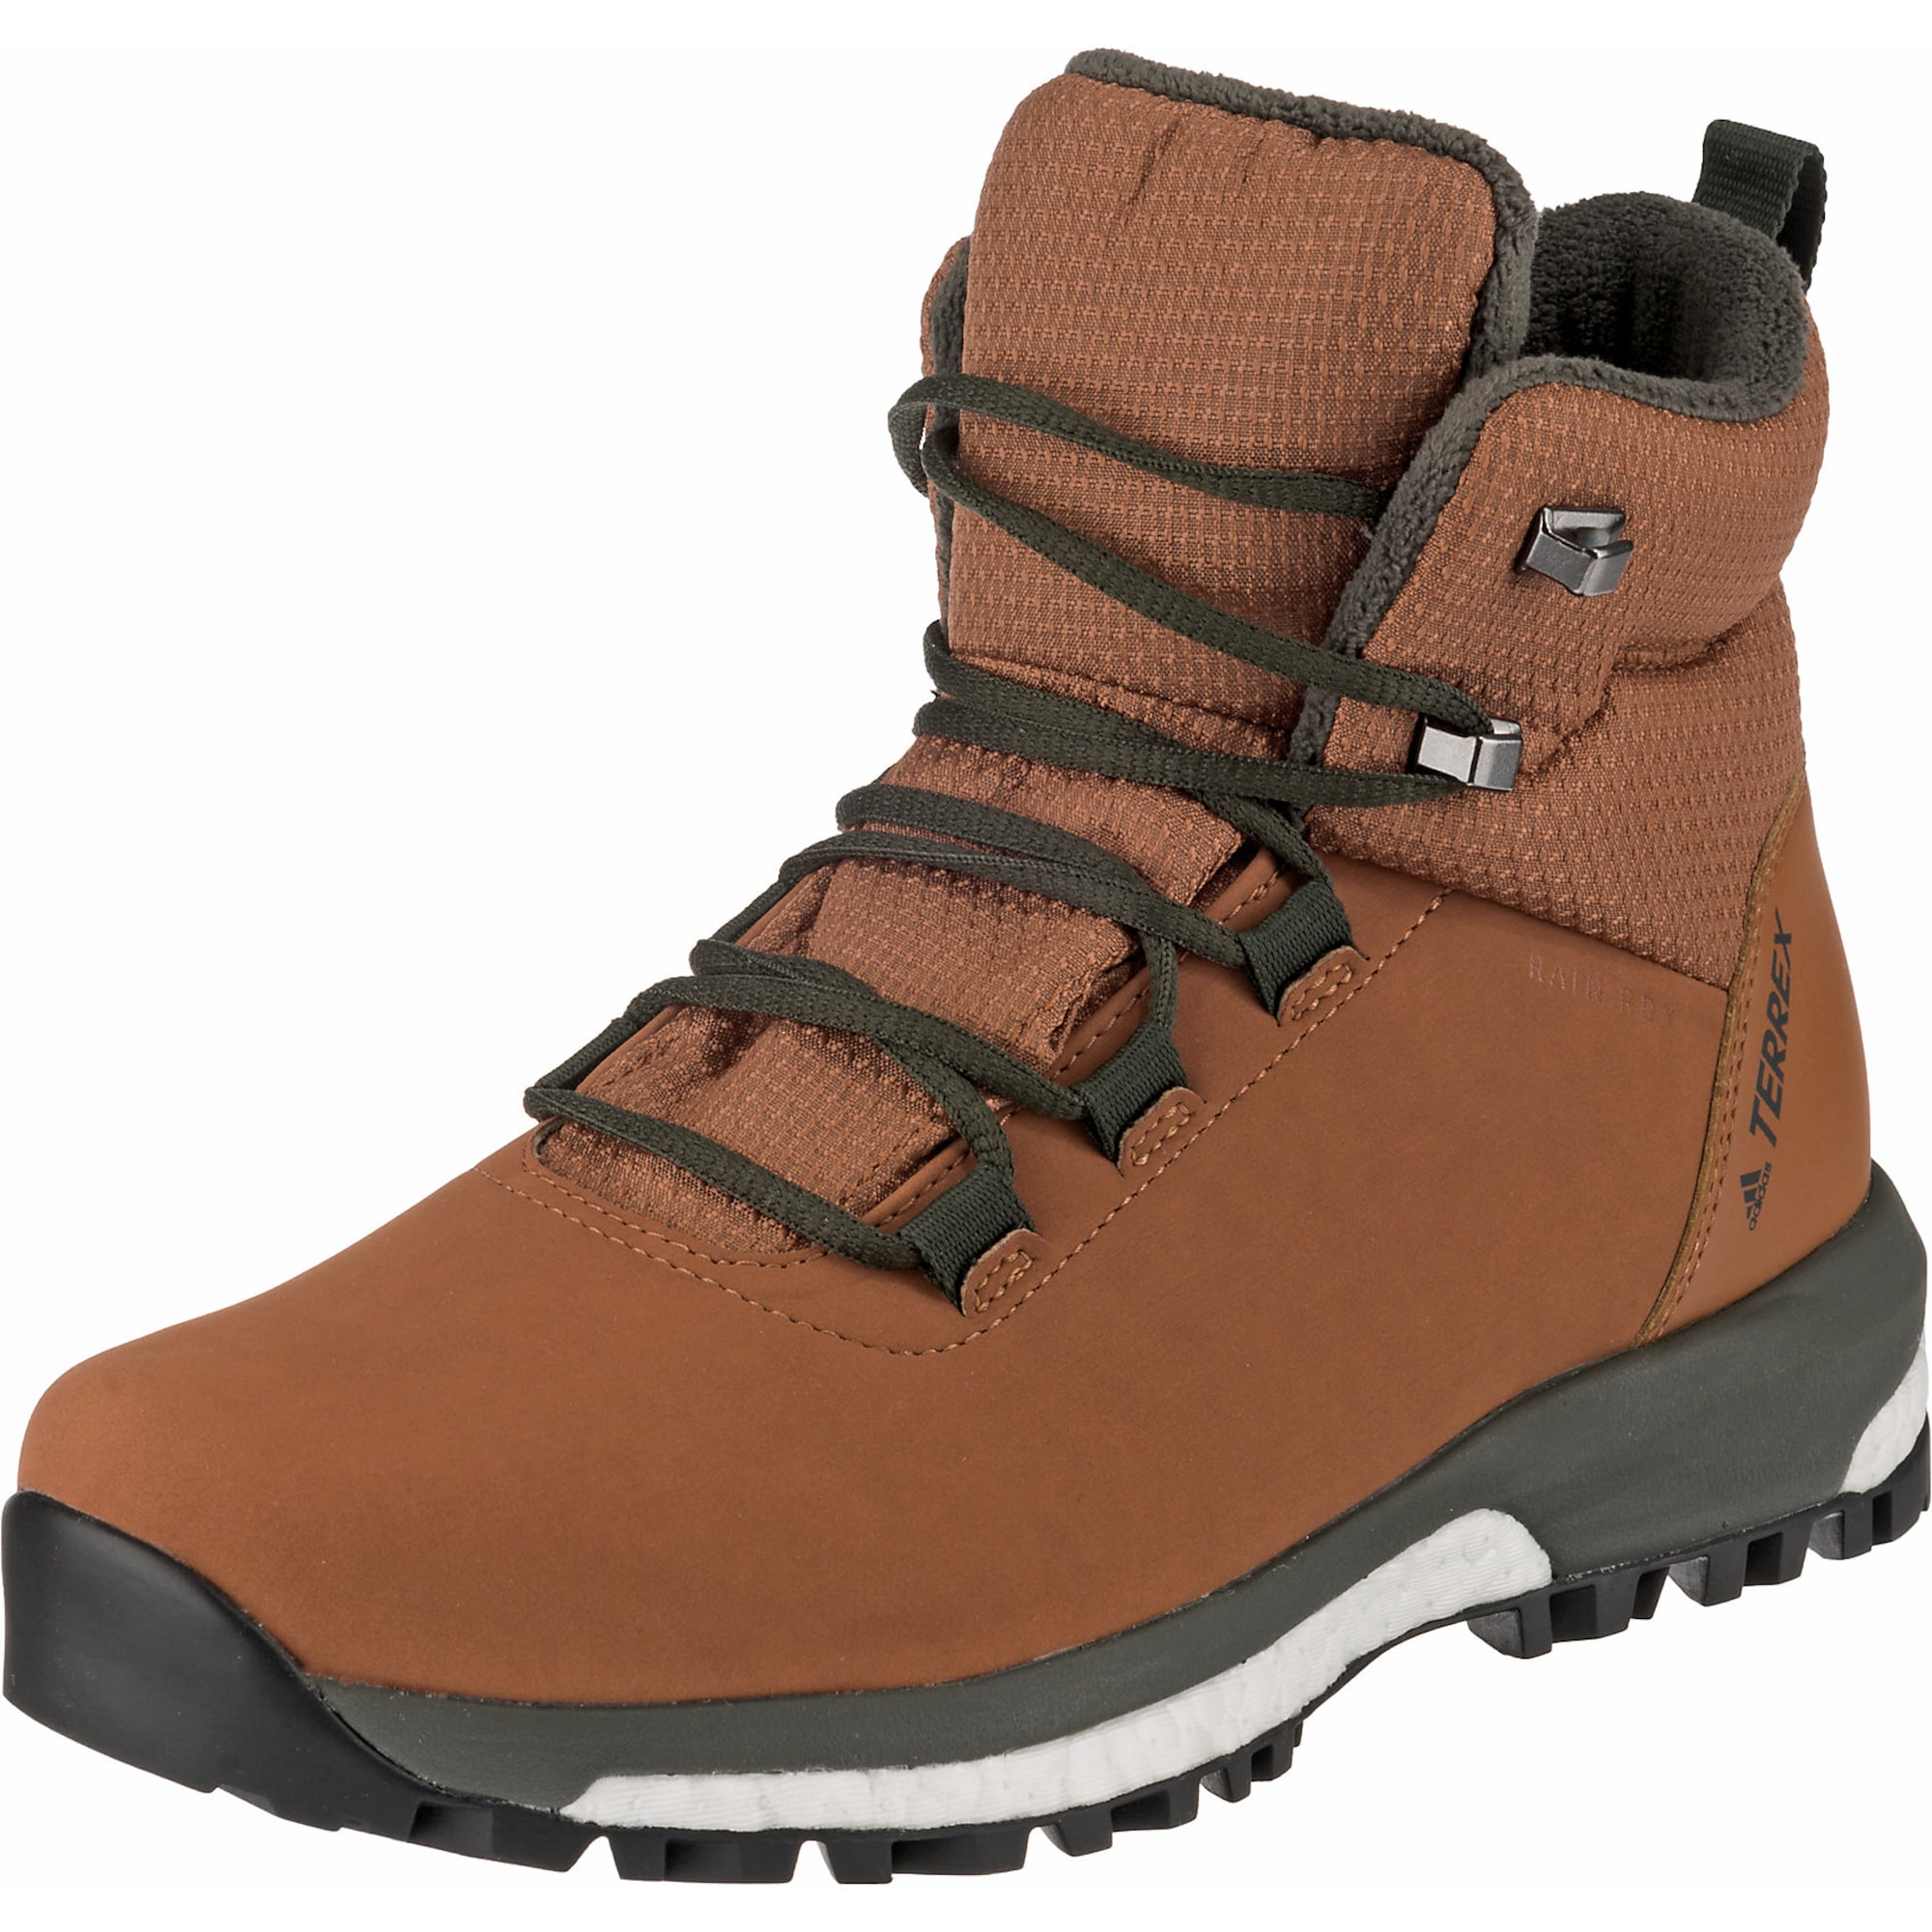 Outdoorwinterstiefel | Schuhe > Outdoorschuhe > Outdoorwinterstiefel | adidas performance